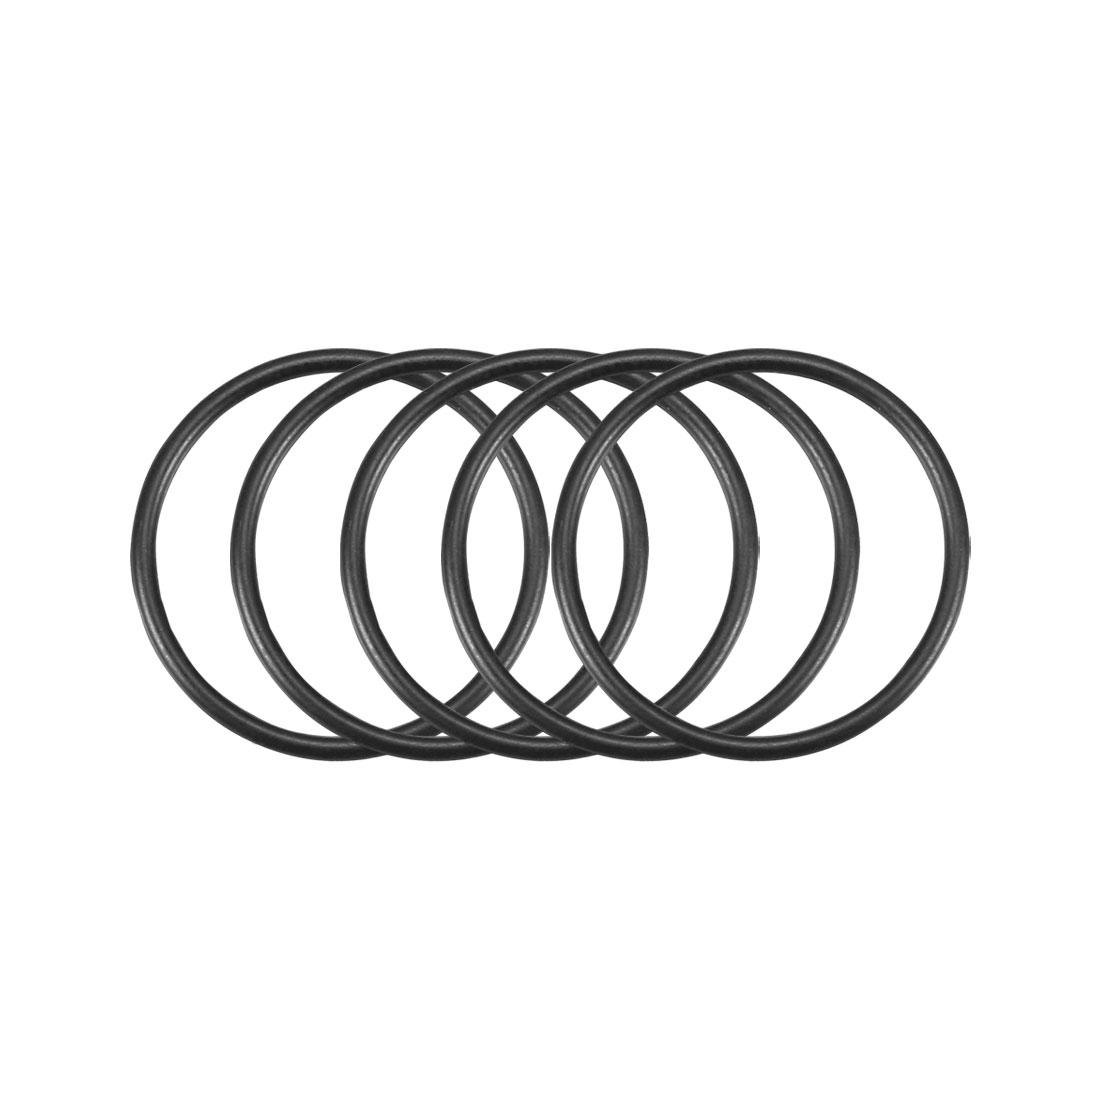 50Pcs Black 20mm x 1.2mm Nitrile Rubber O Ring NBR Oil Sealing Grommets